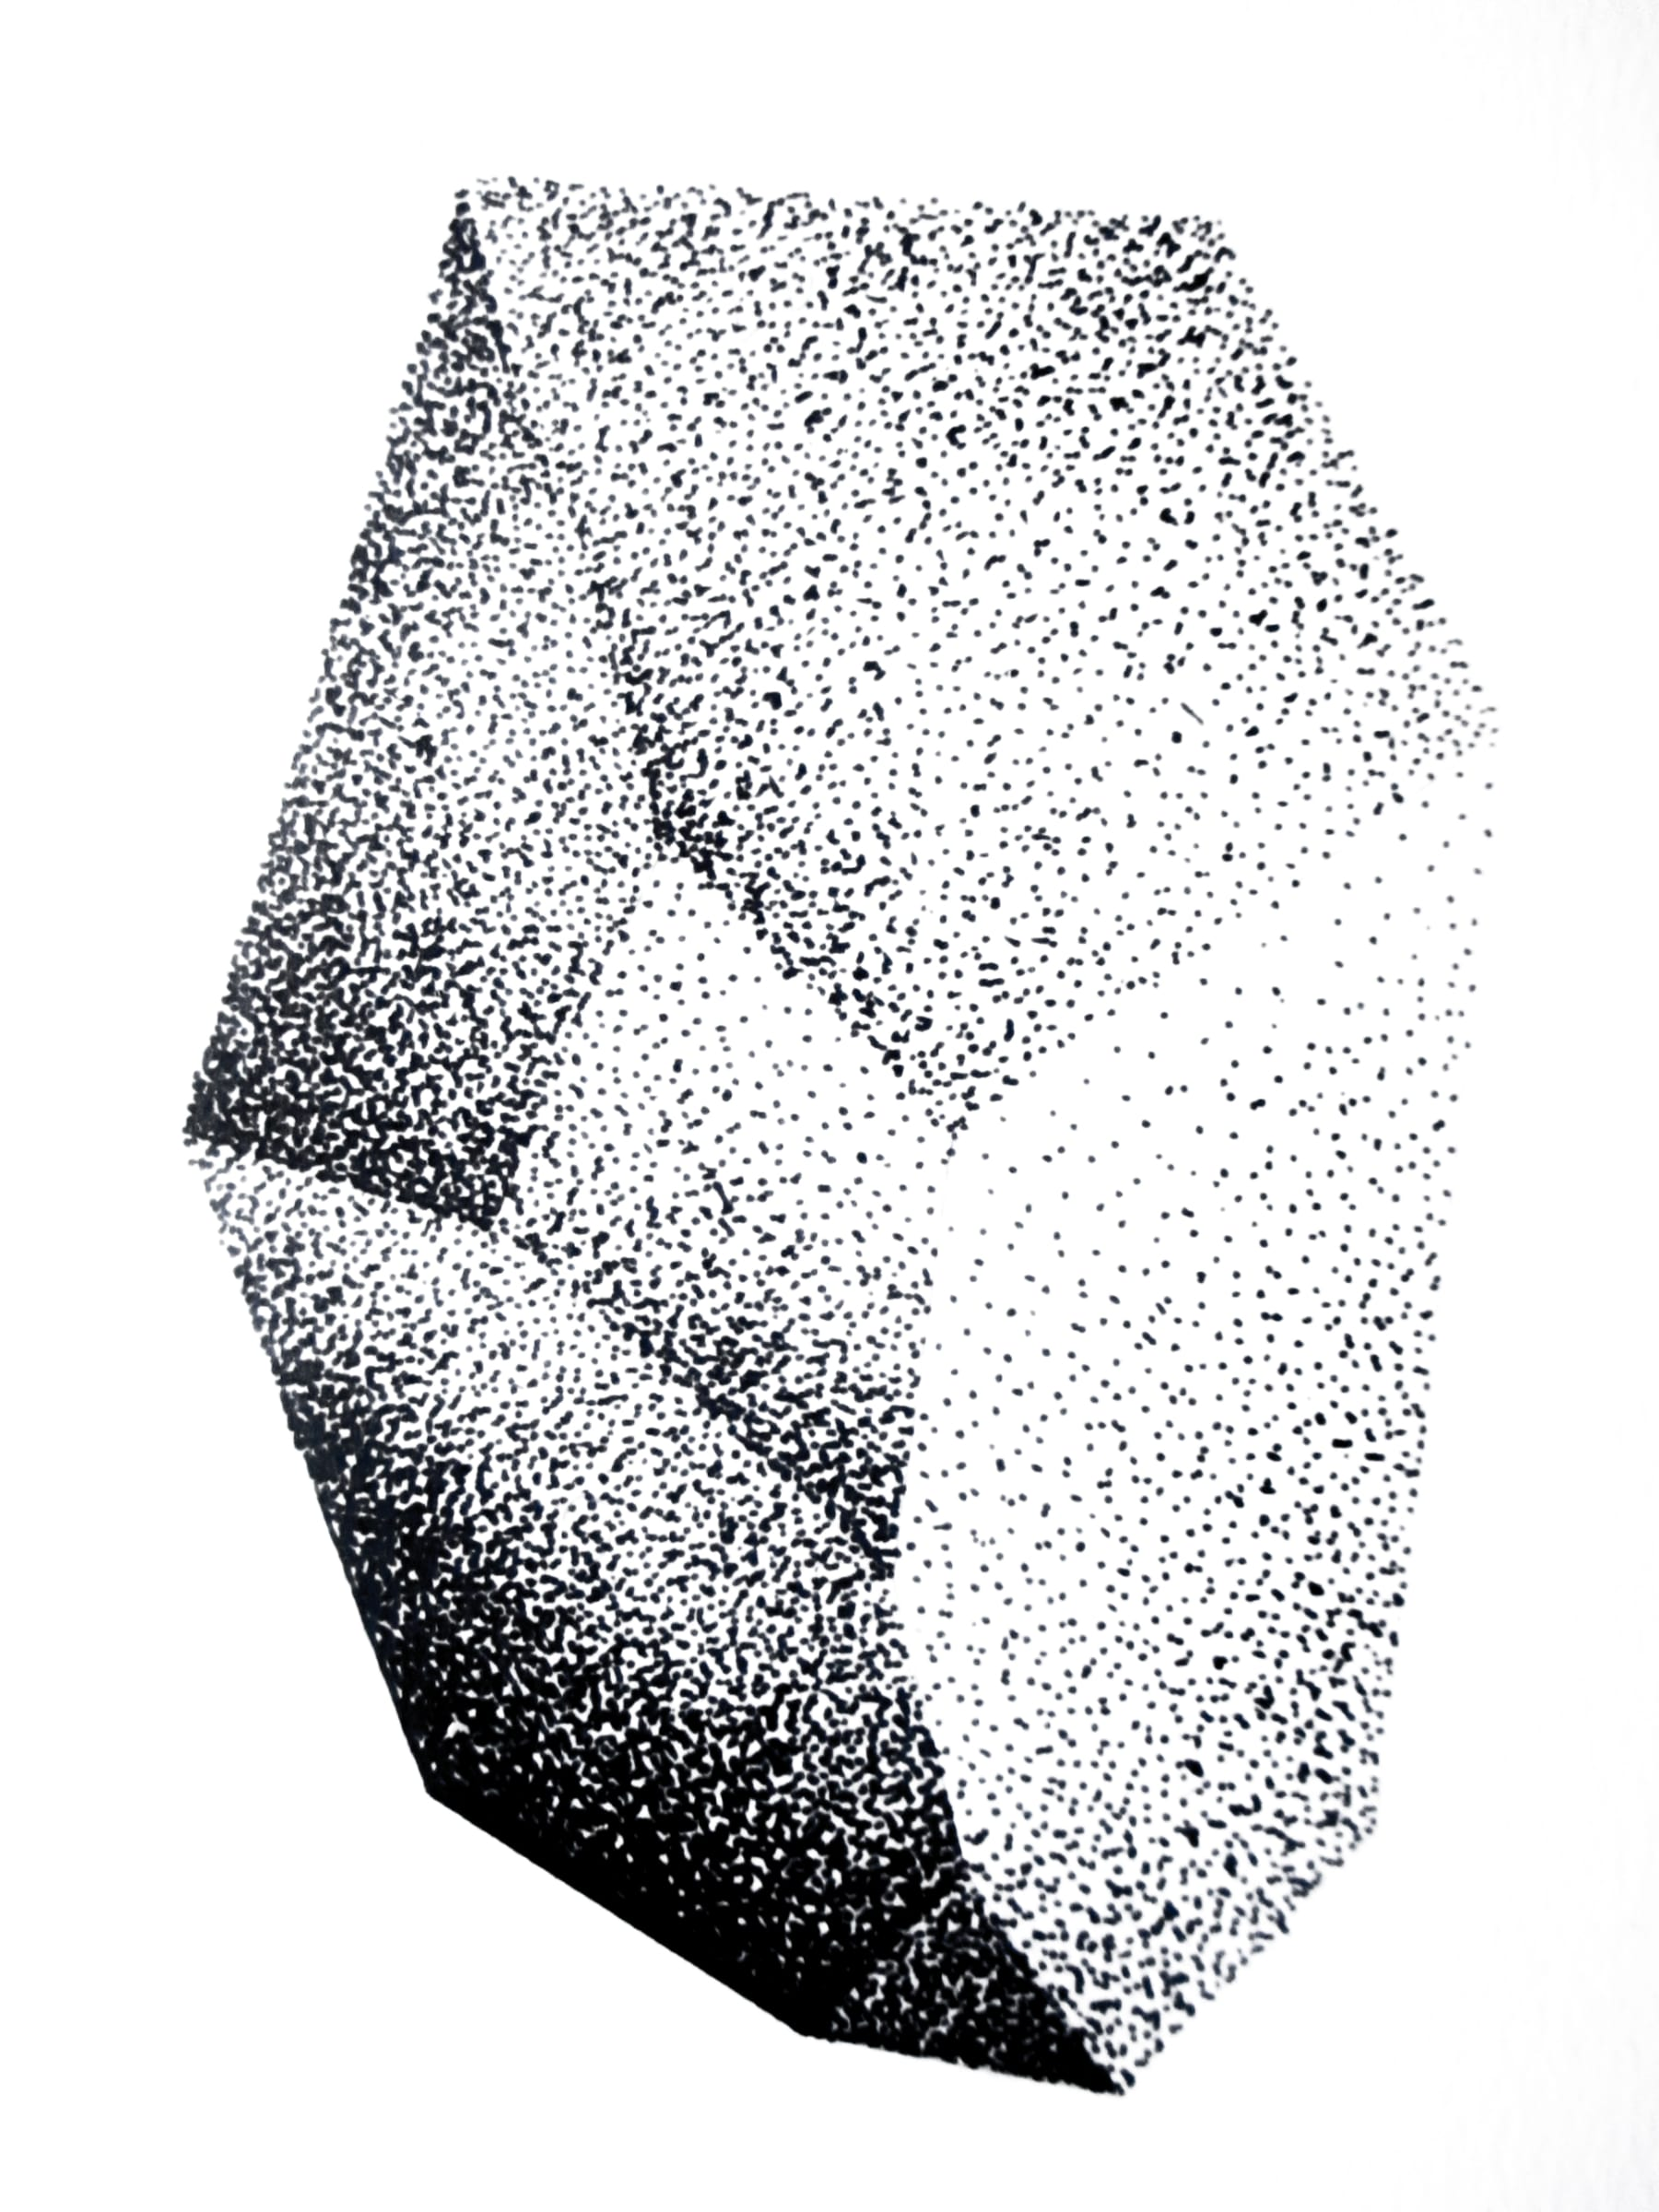 <span class=&#34;link fancybox-details-link&#34;><a href=&#34;/content/viewing-room/54/artworks2312/&#34;>View Detail Page</a></span><div class=&#34;medium&#34;>Ink On Watercolour Paper</div> <div class=&#34;dimensions&#34;>21cm x 14.8cm</div>